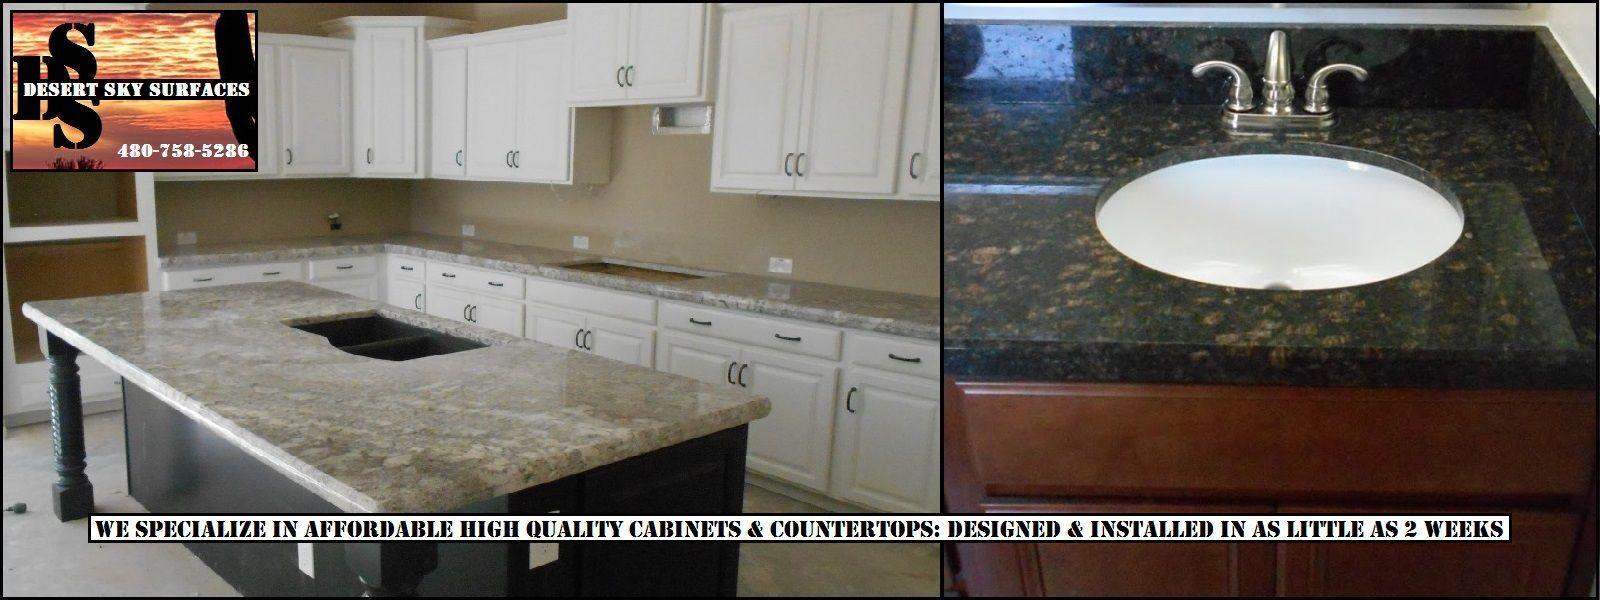 Discount Countertops For Kitchen Bath In Mesa Gilbert Chandler Az Bathroom Countertops Countertops Cabinets And Countertops